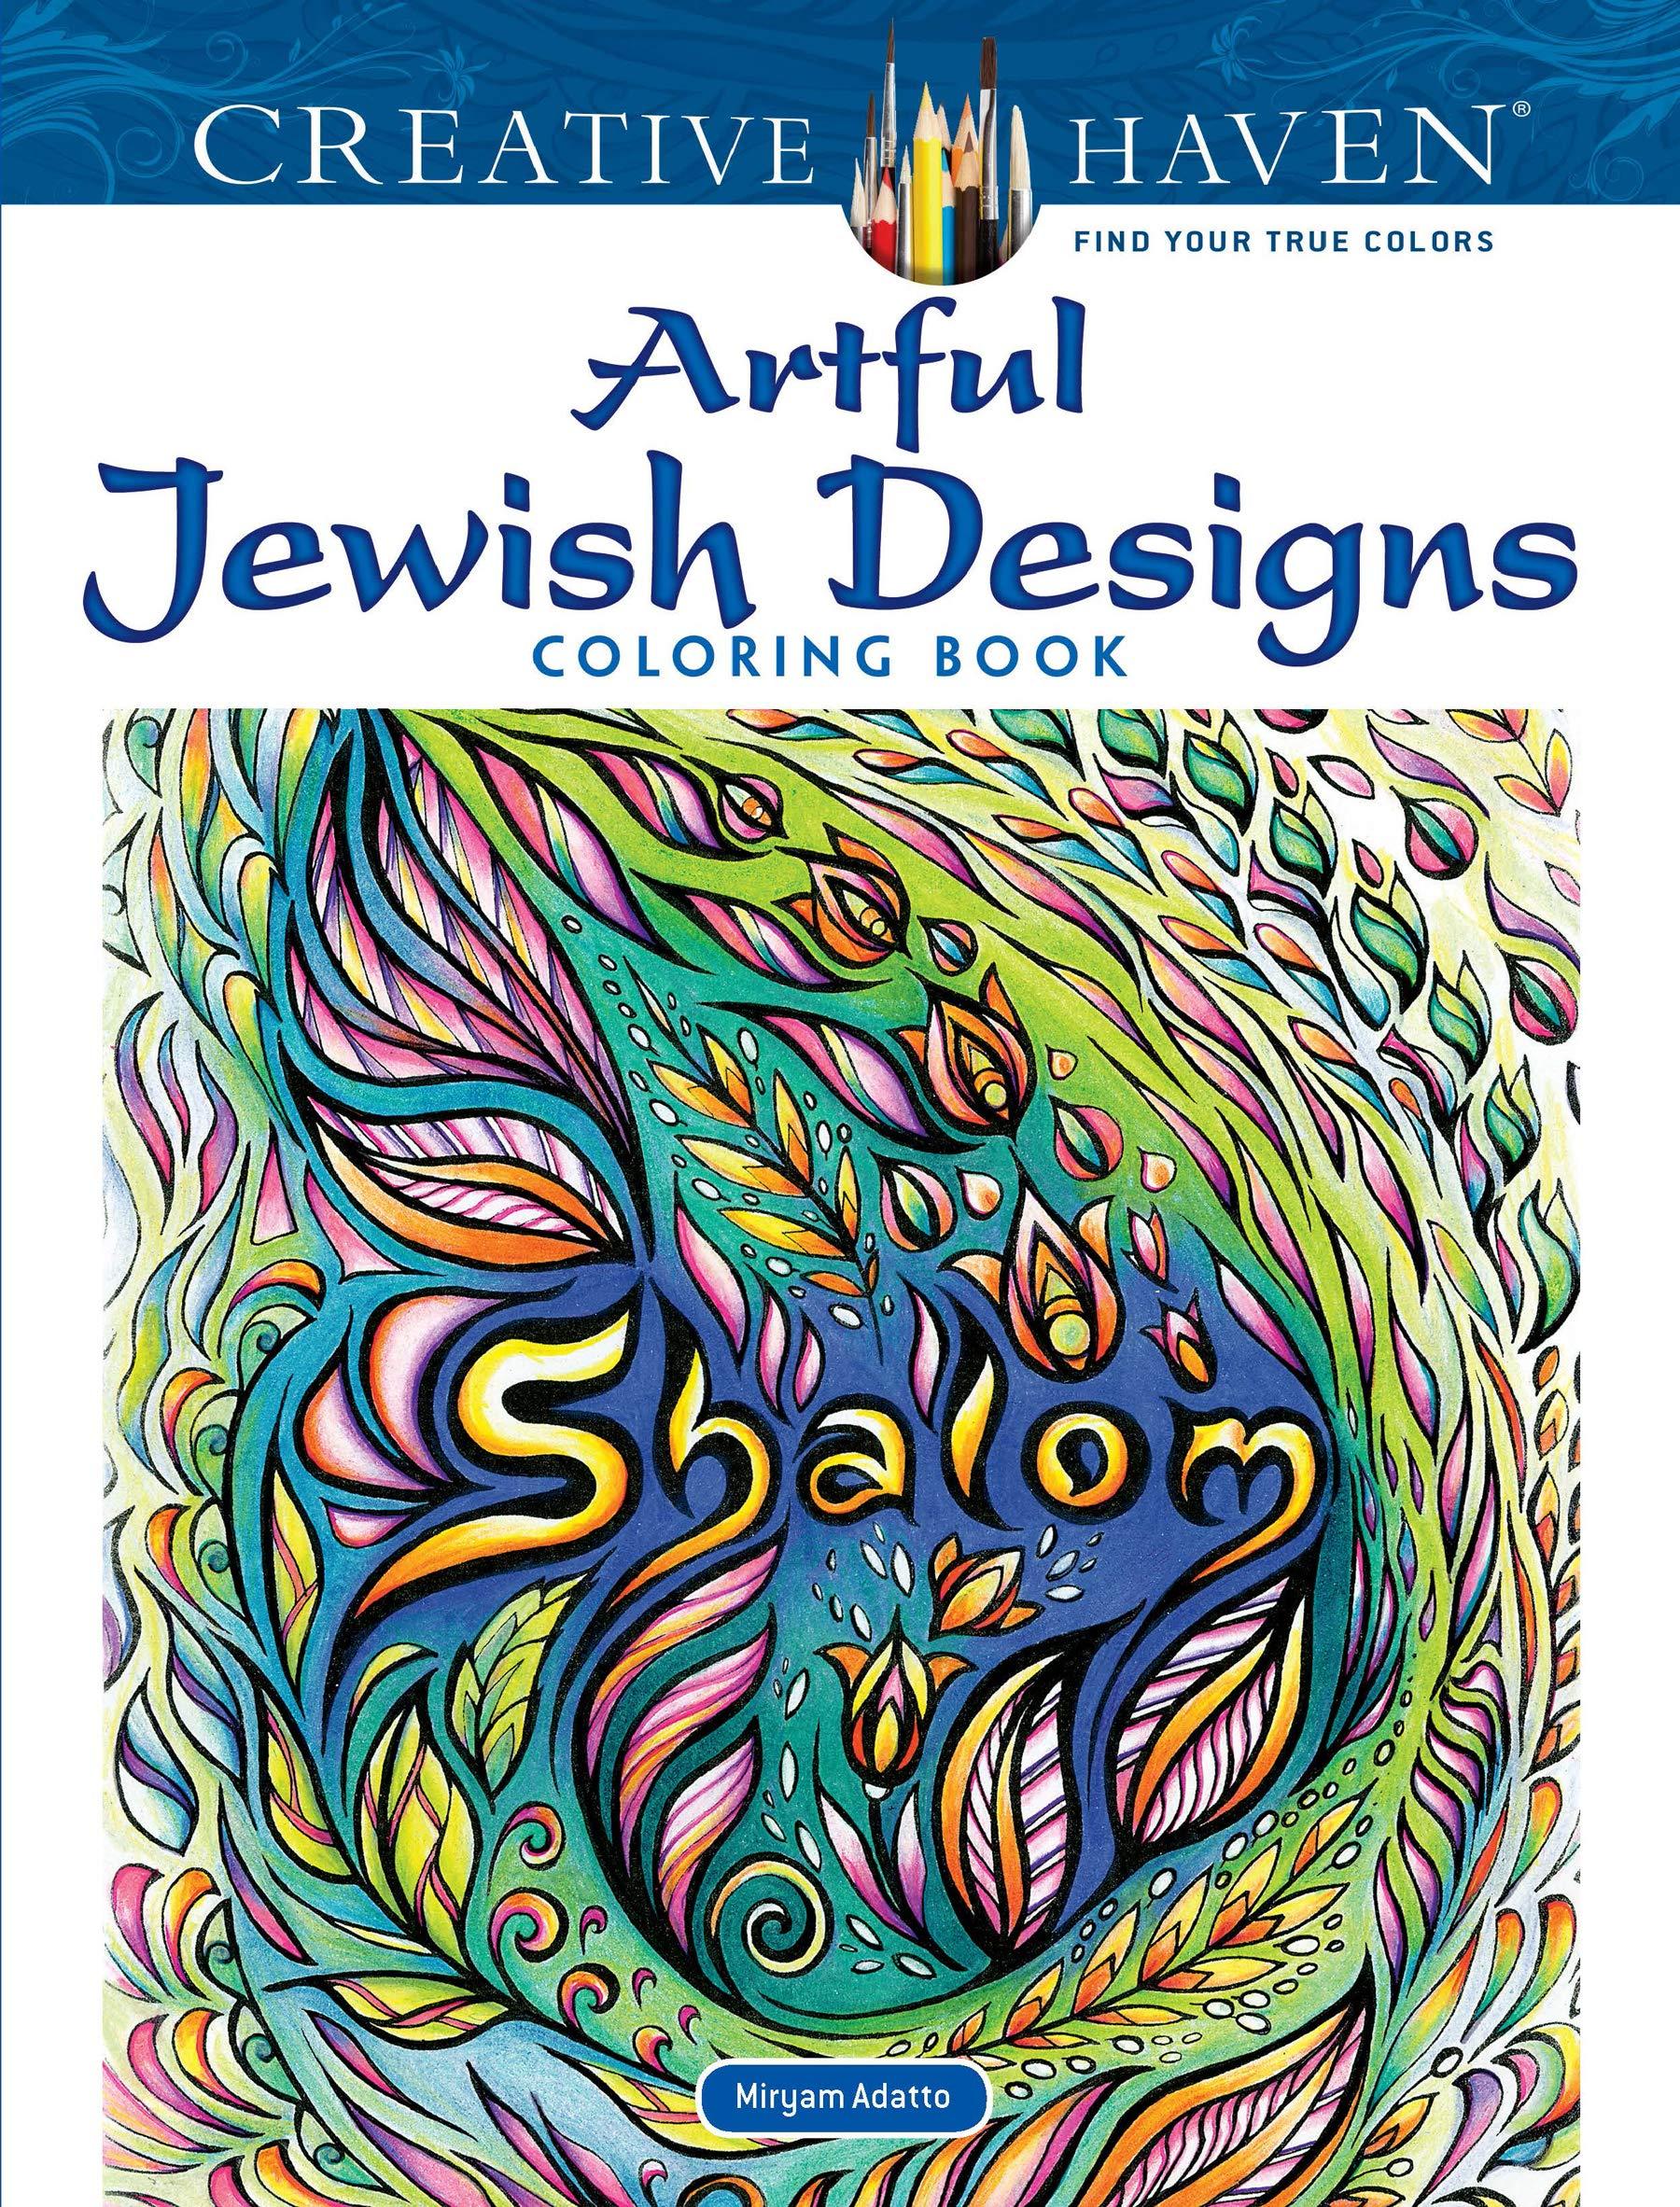 Creative Artful Jewish Designs Coloring product image